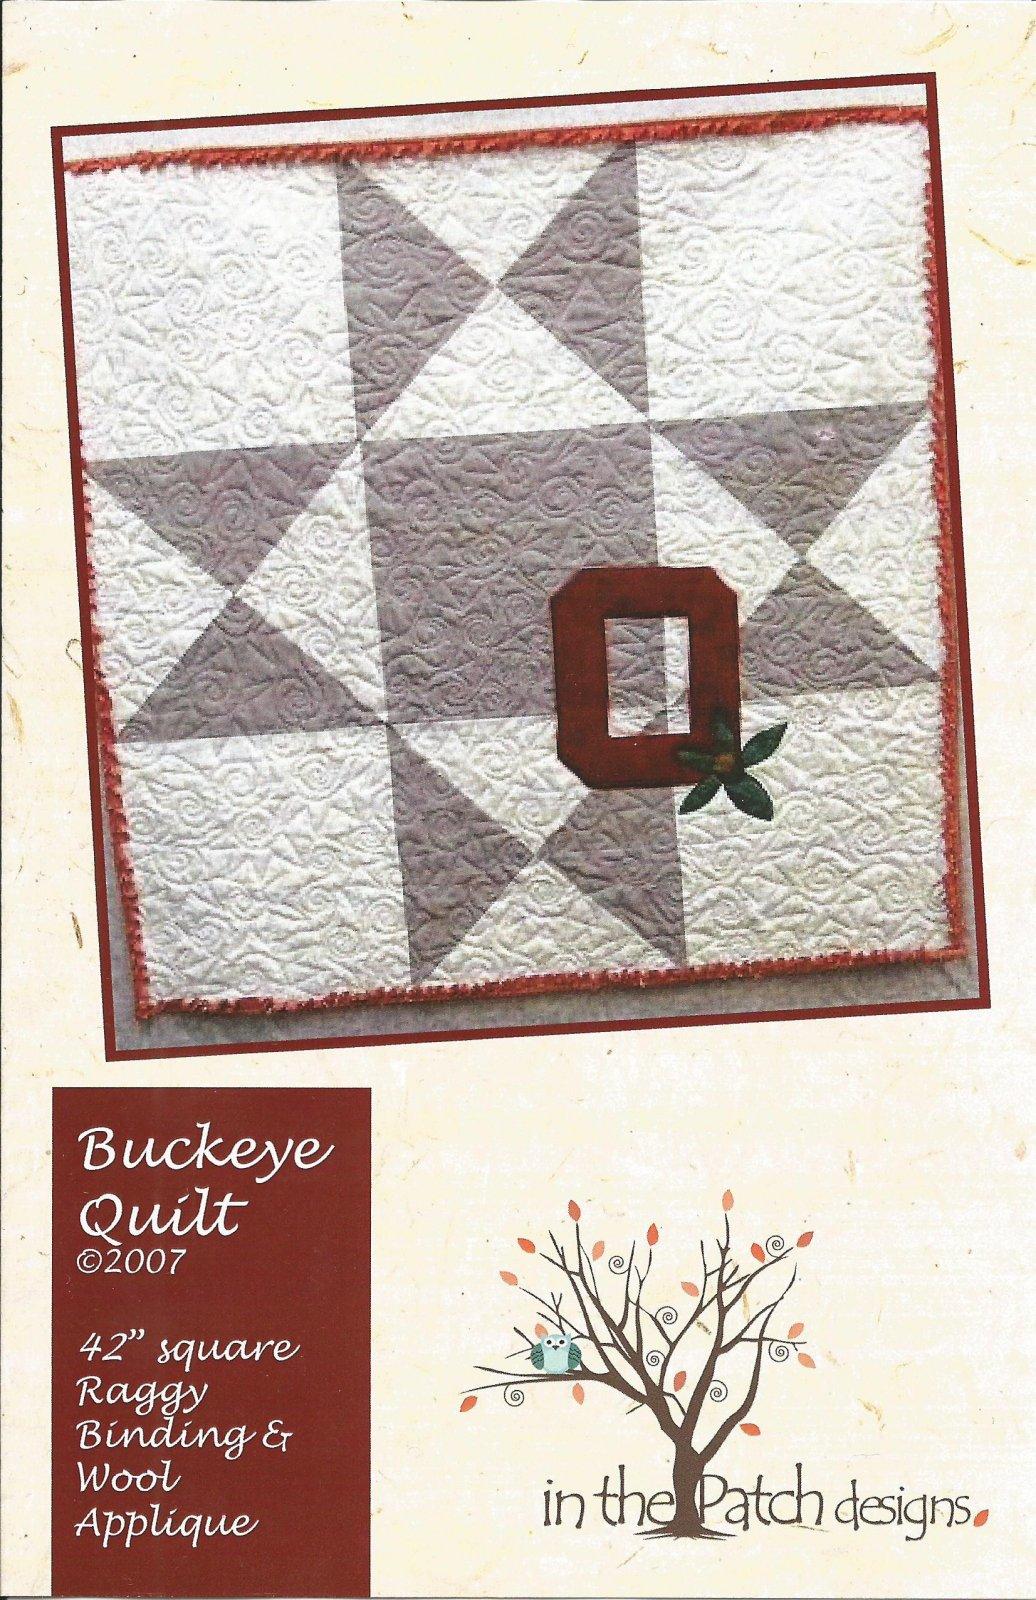 Buckeye Quilt